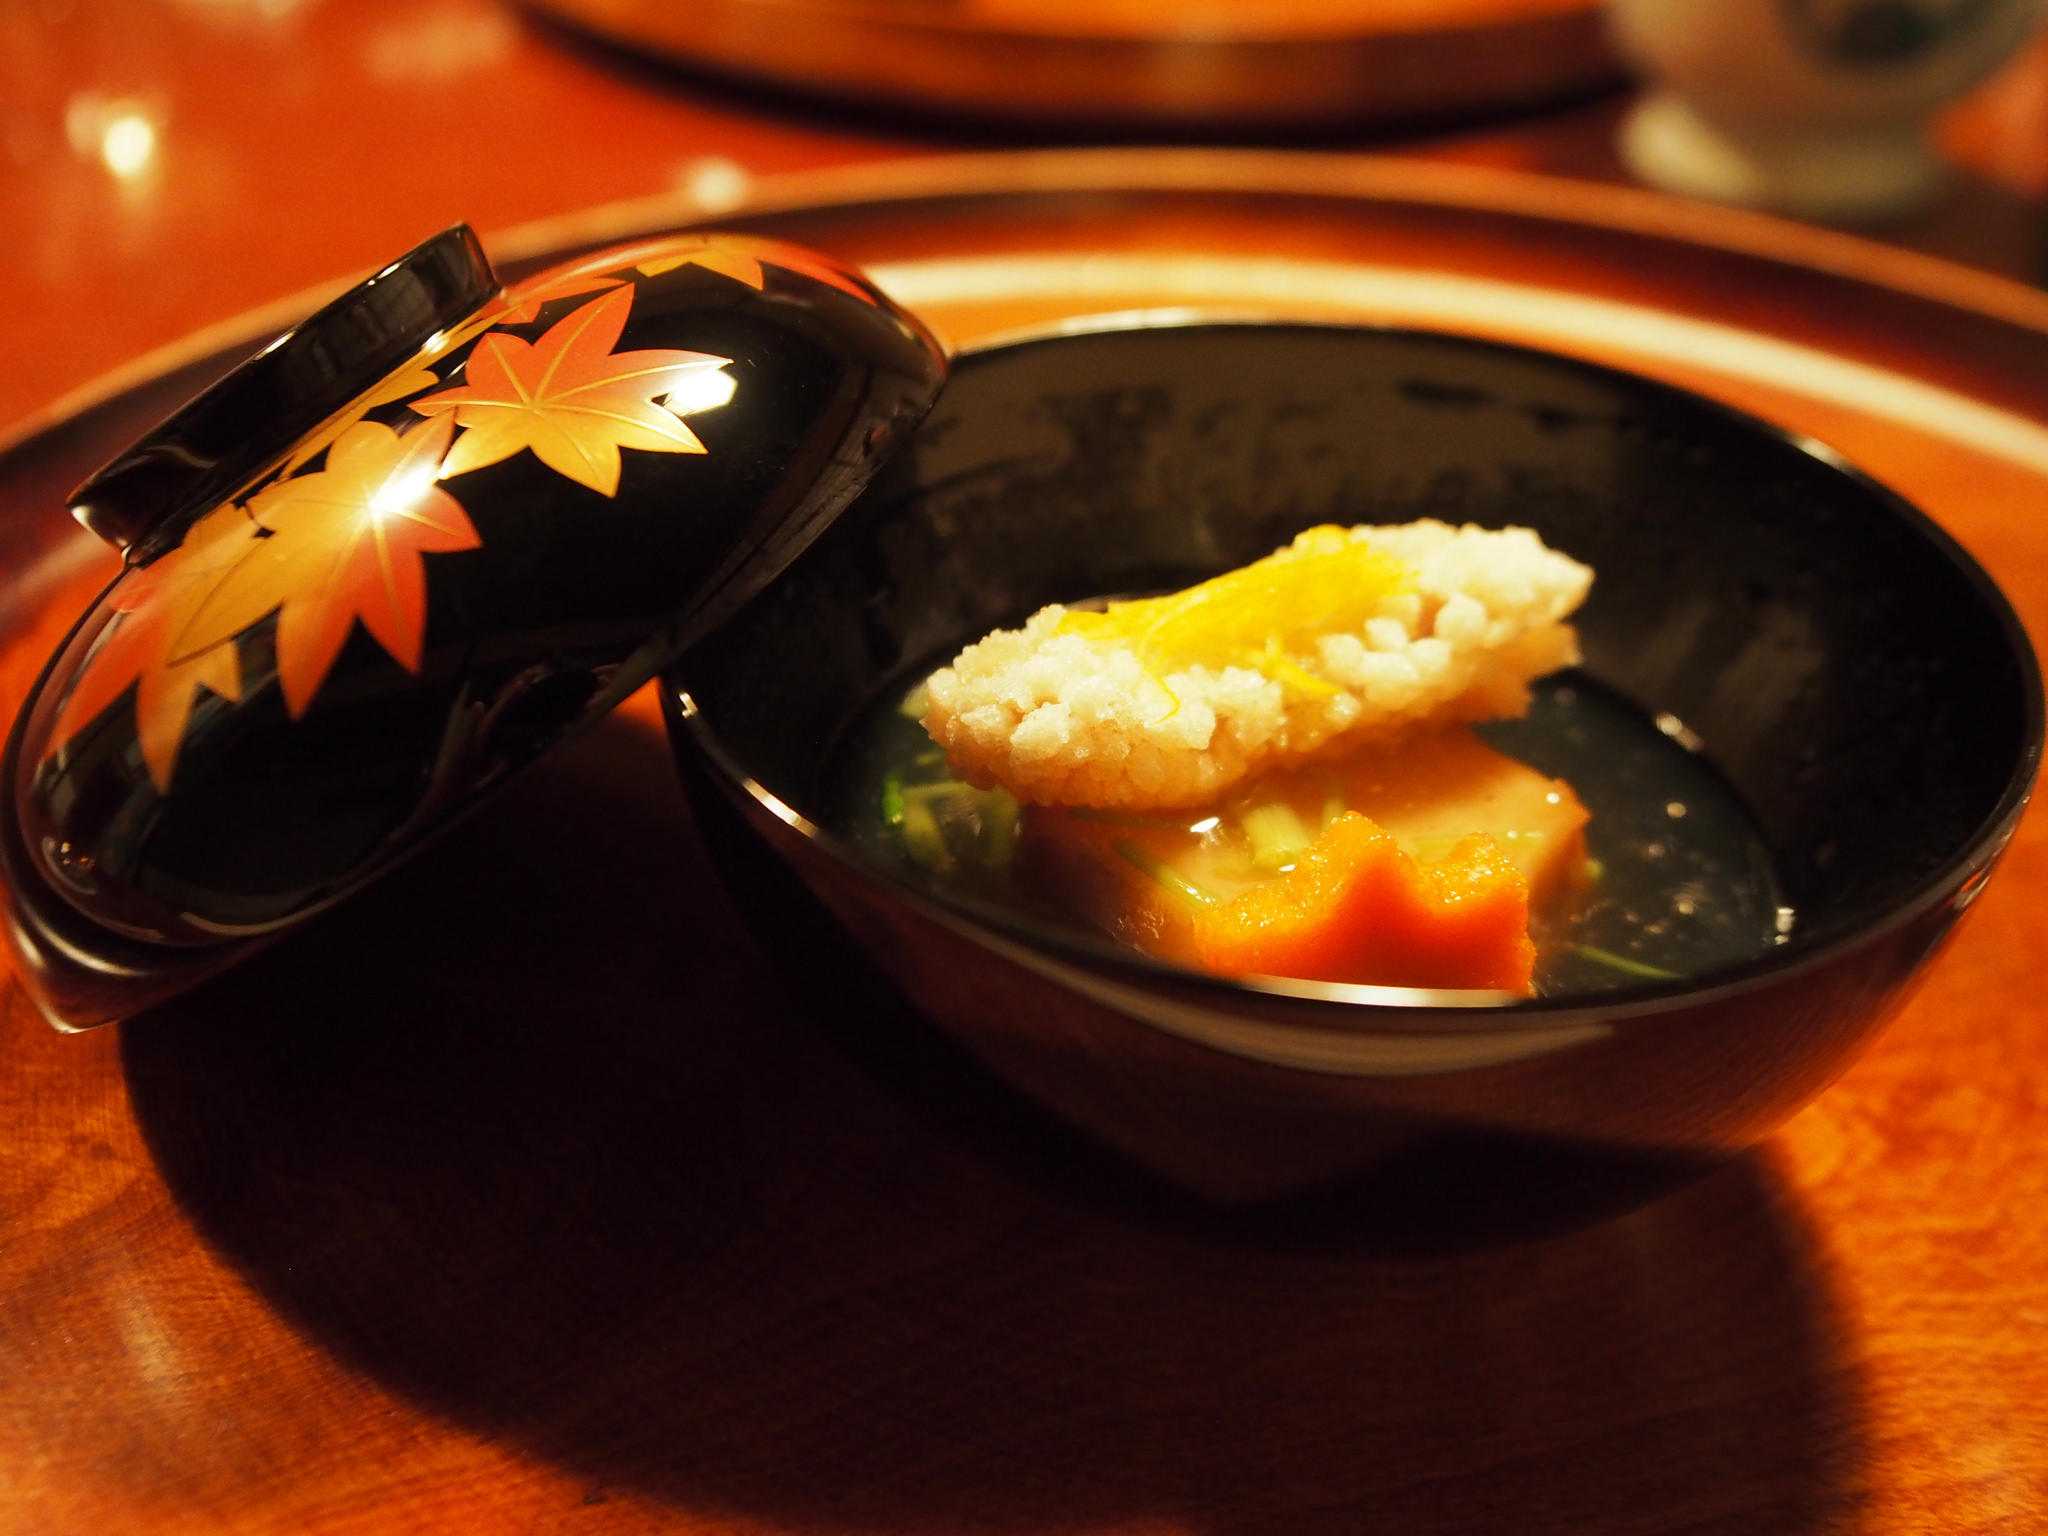 A nimono (stewed) dish prepared with pumpkin and carrots. ©TOKI